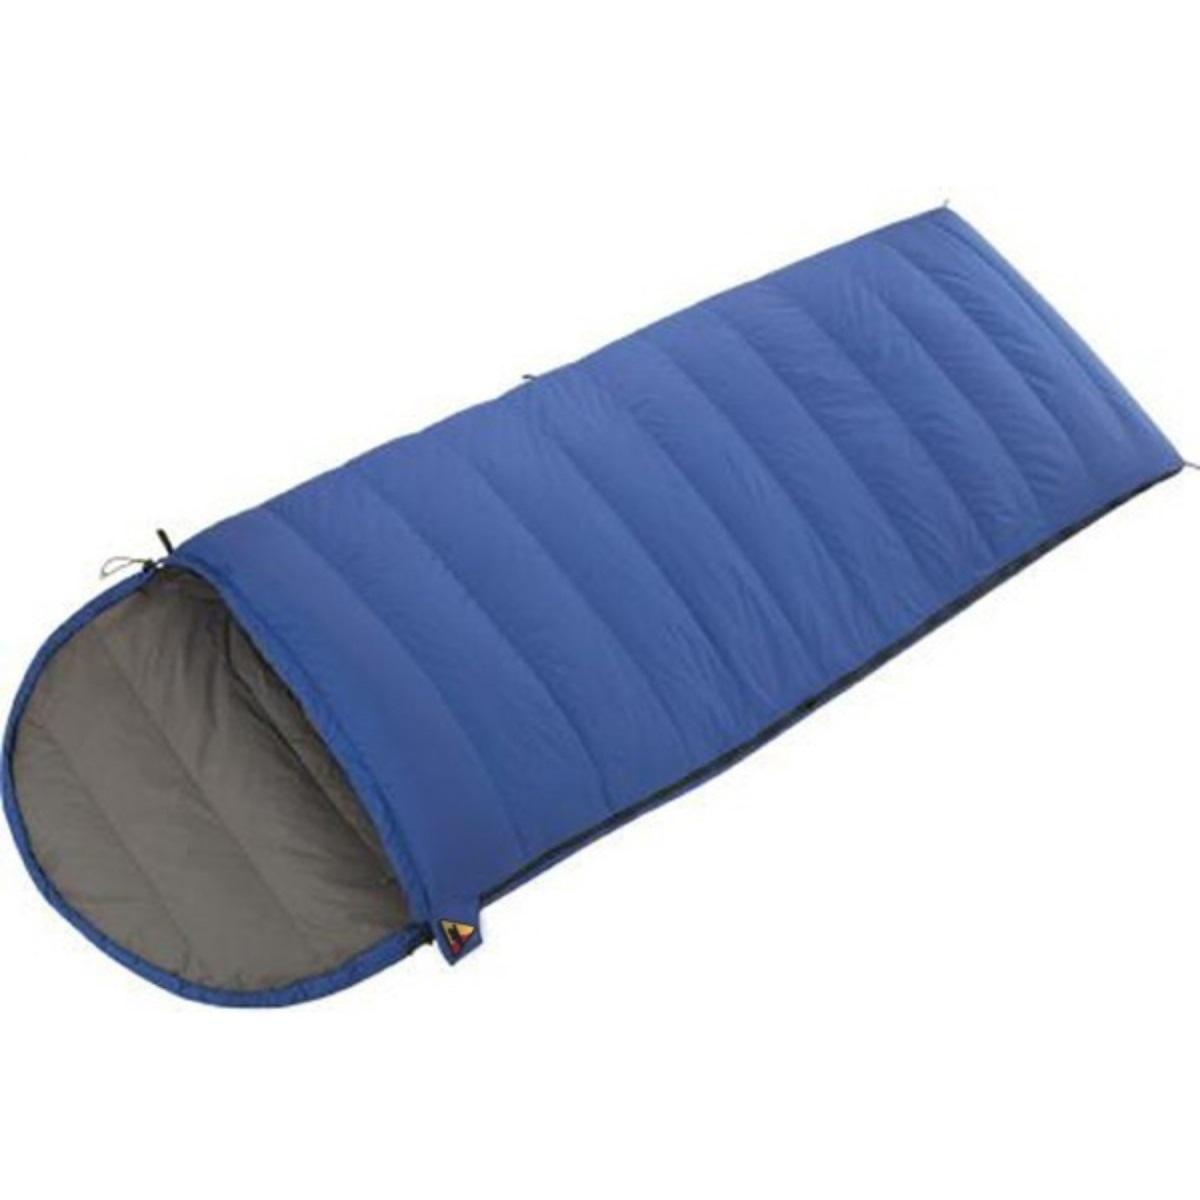 Спальный мешок BASK BLANKET PRO V2 XL 3541